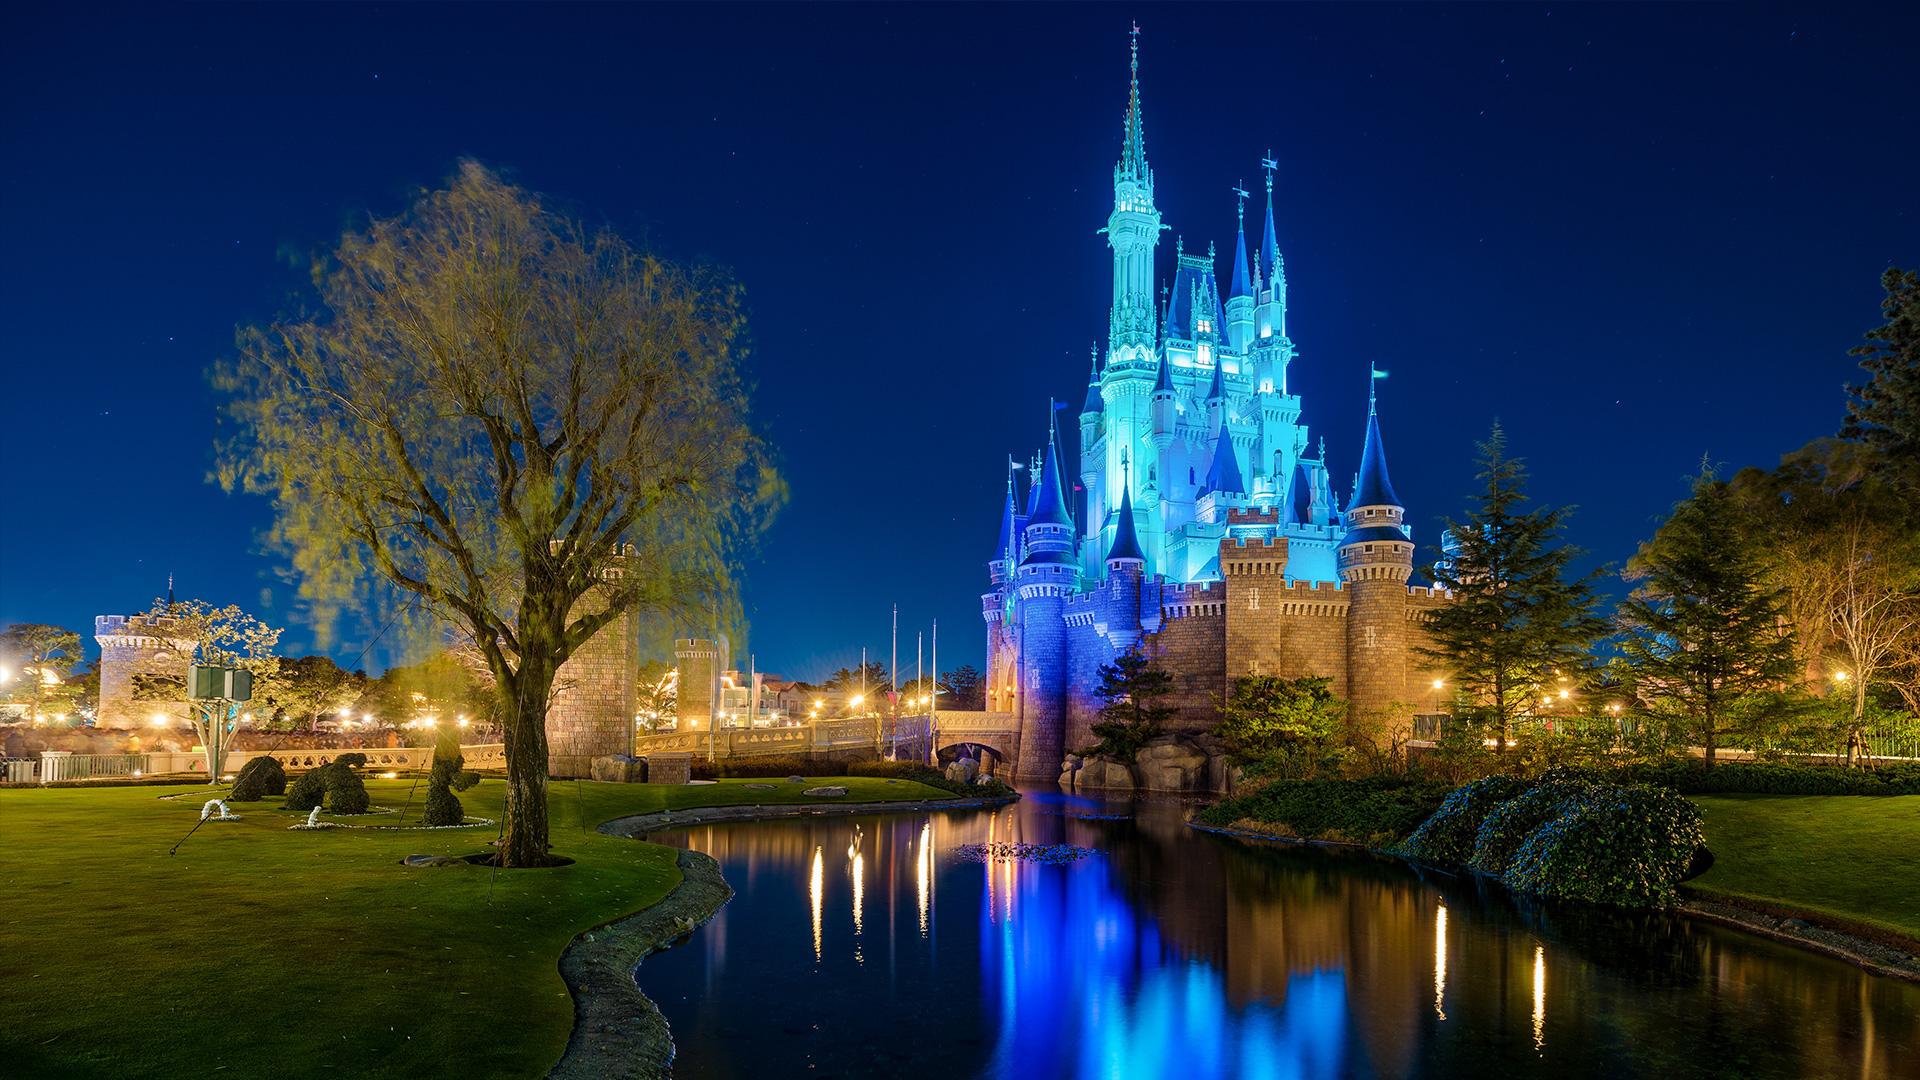 Free Disney Zoom Backgrounds Wallpapers Disney Tourist Blog